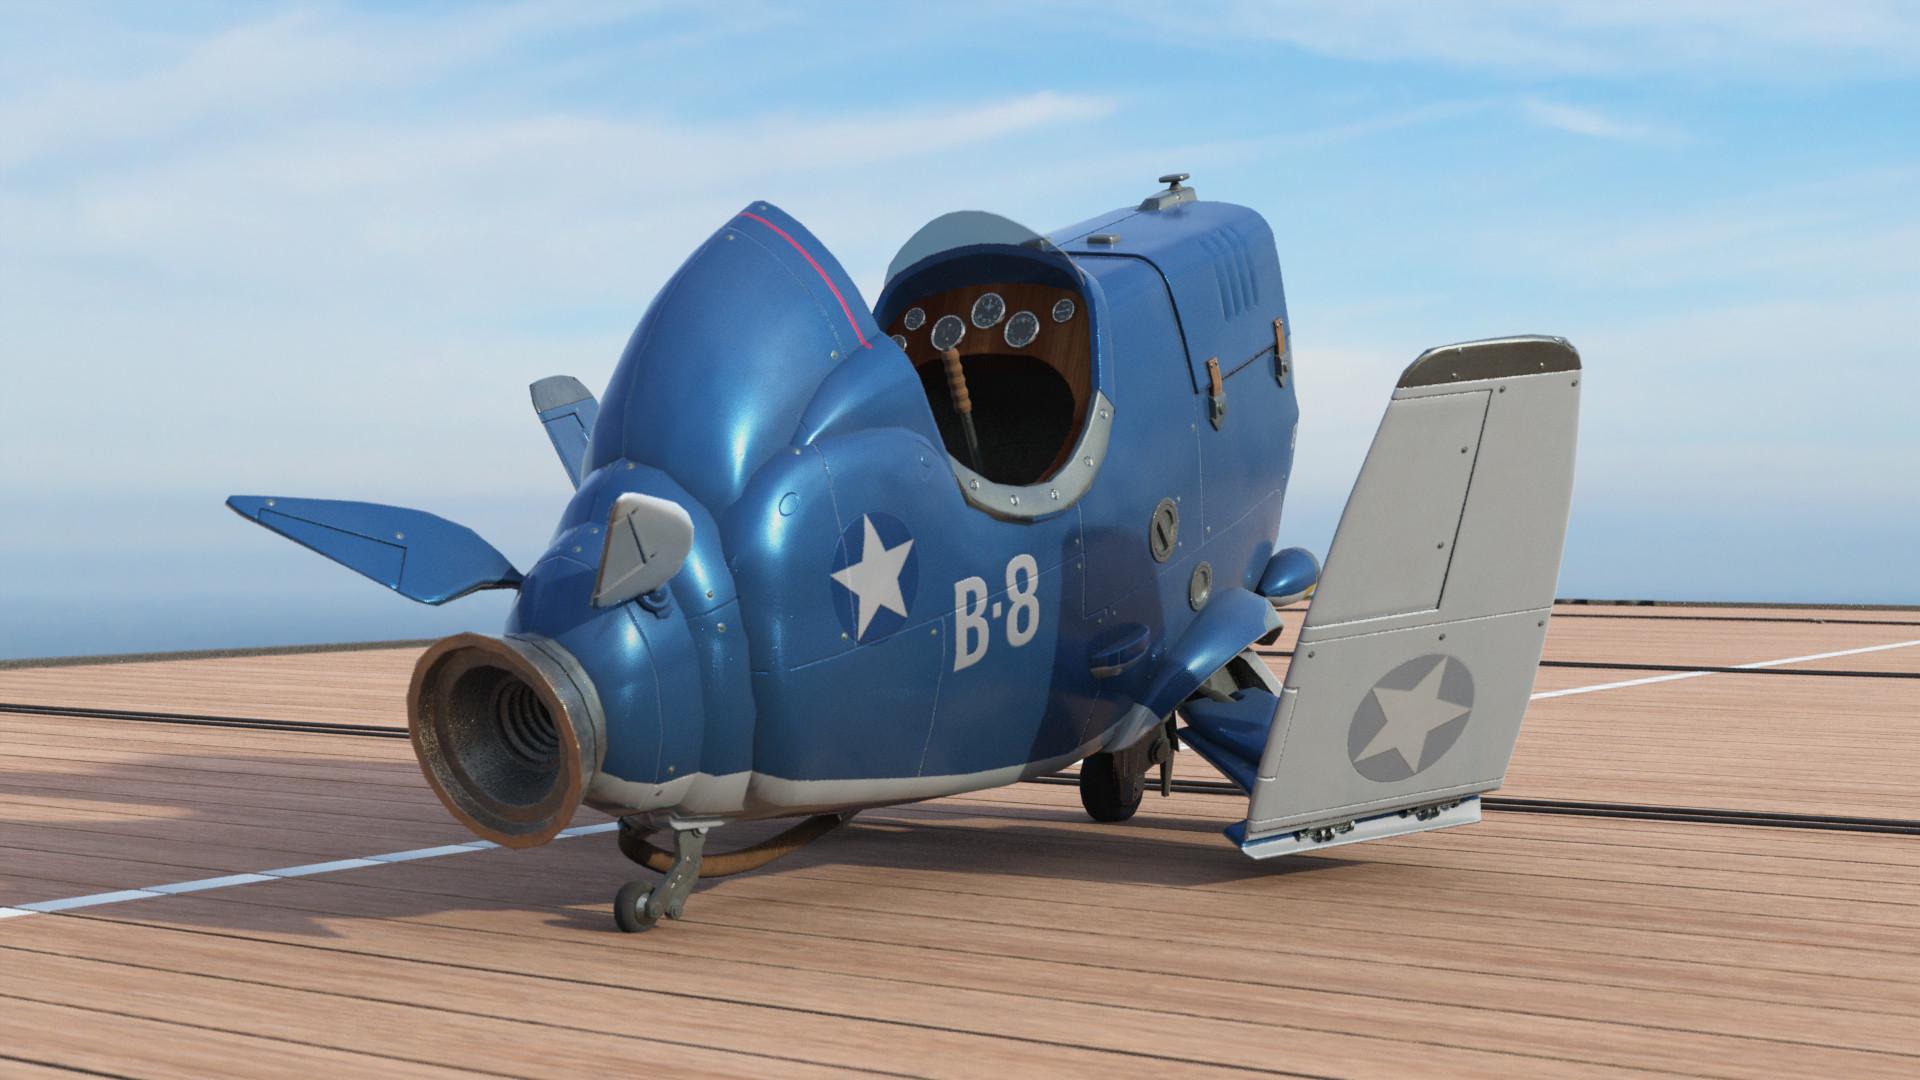 John griffiths seaplane wingsup render 02